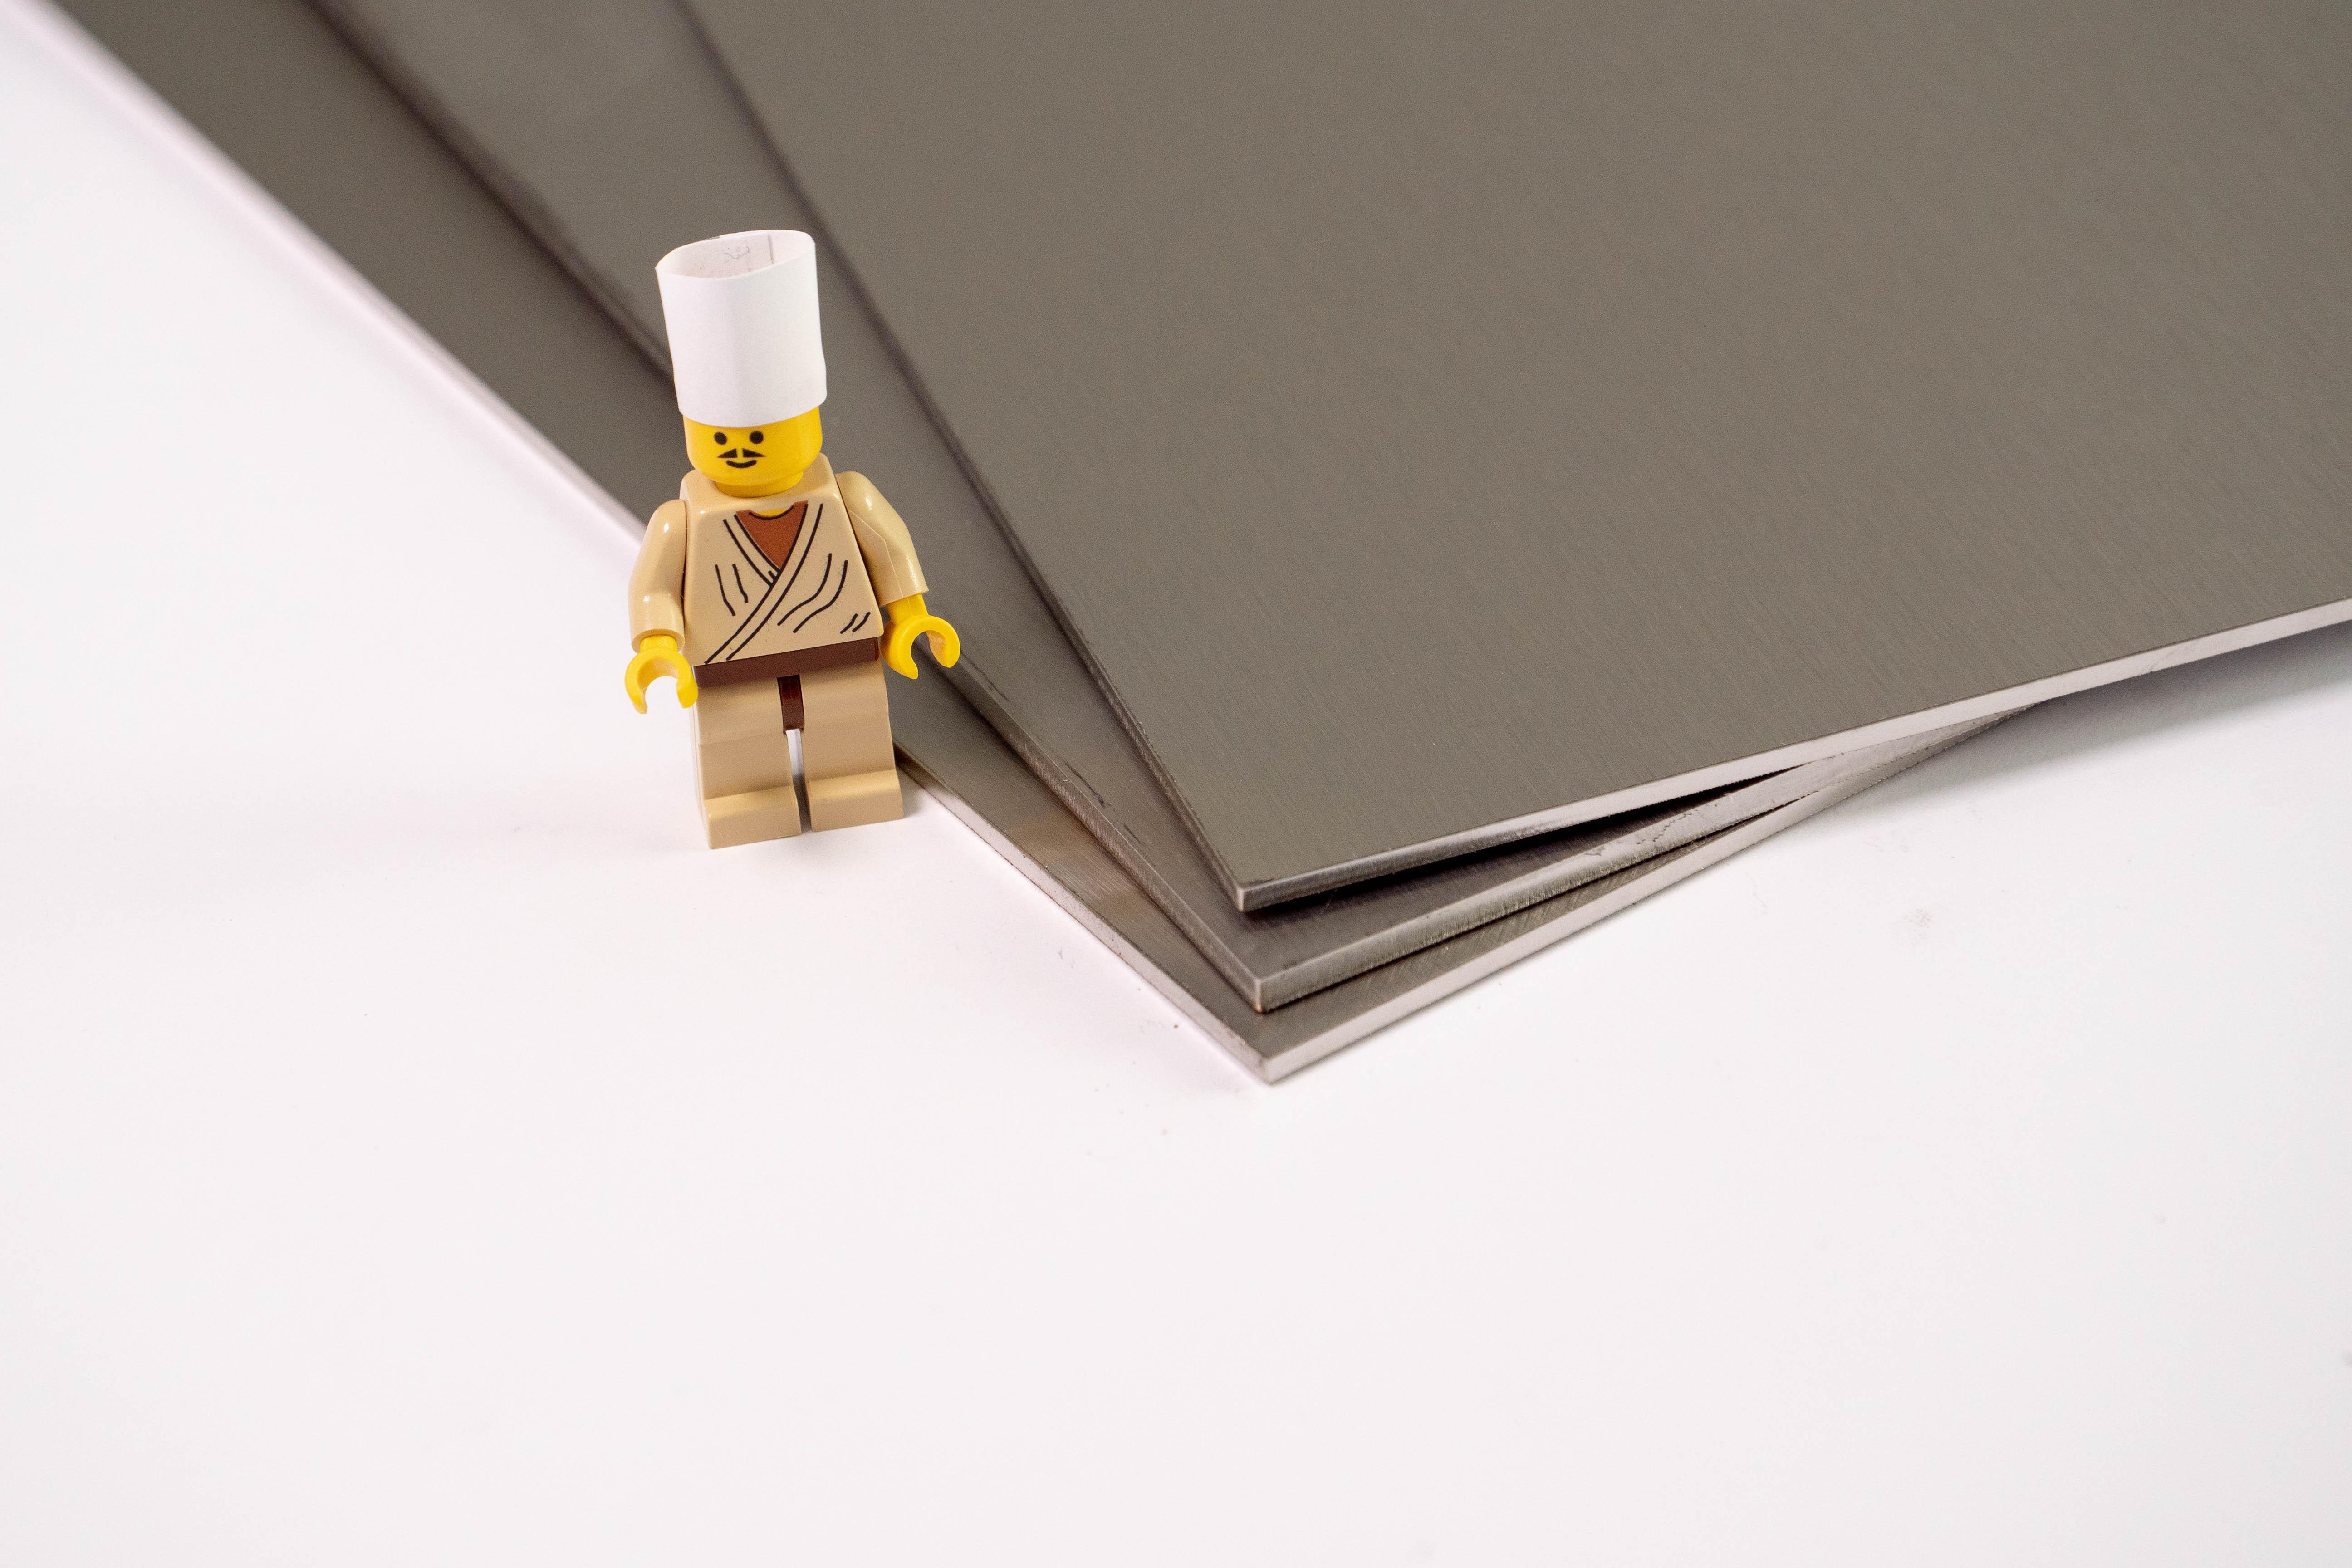 Feuille D Inox À Coller plaque inox 304l brossé alimentaire - john steel